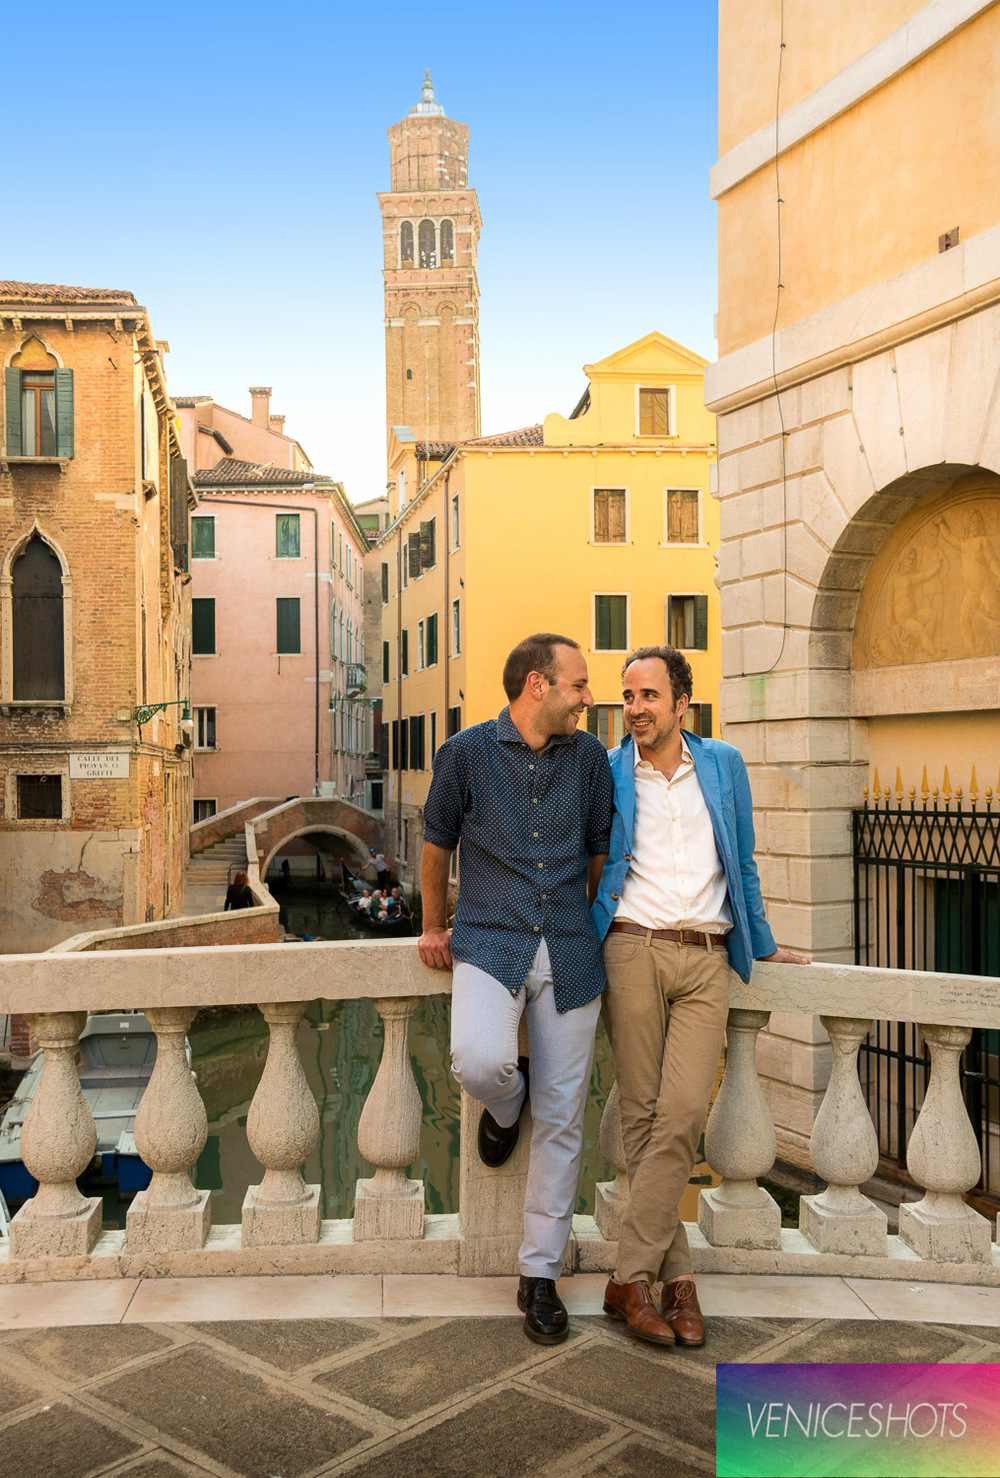 fotografia professionale Venezia_copyright claudia Rossini veniceshots.com_3663_veniceshots.com_alta risoluz_.jpg